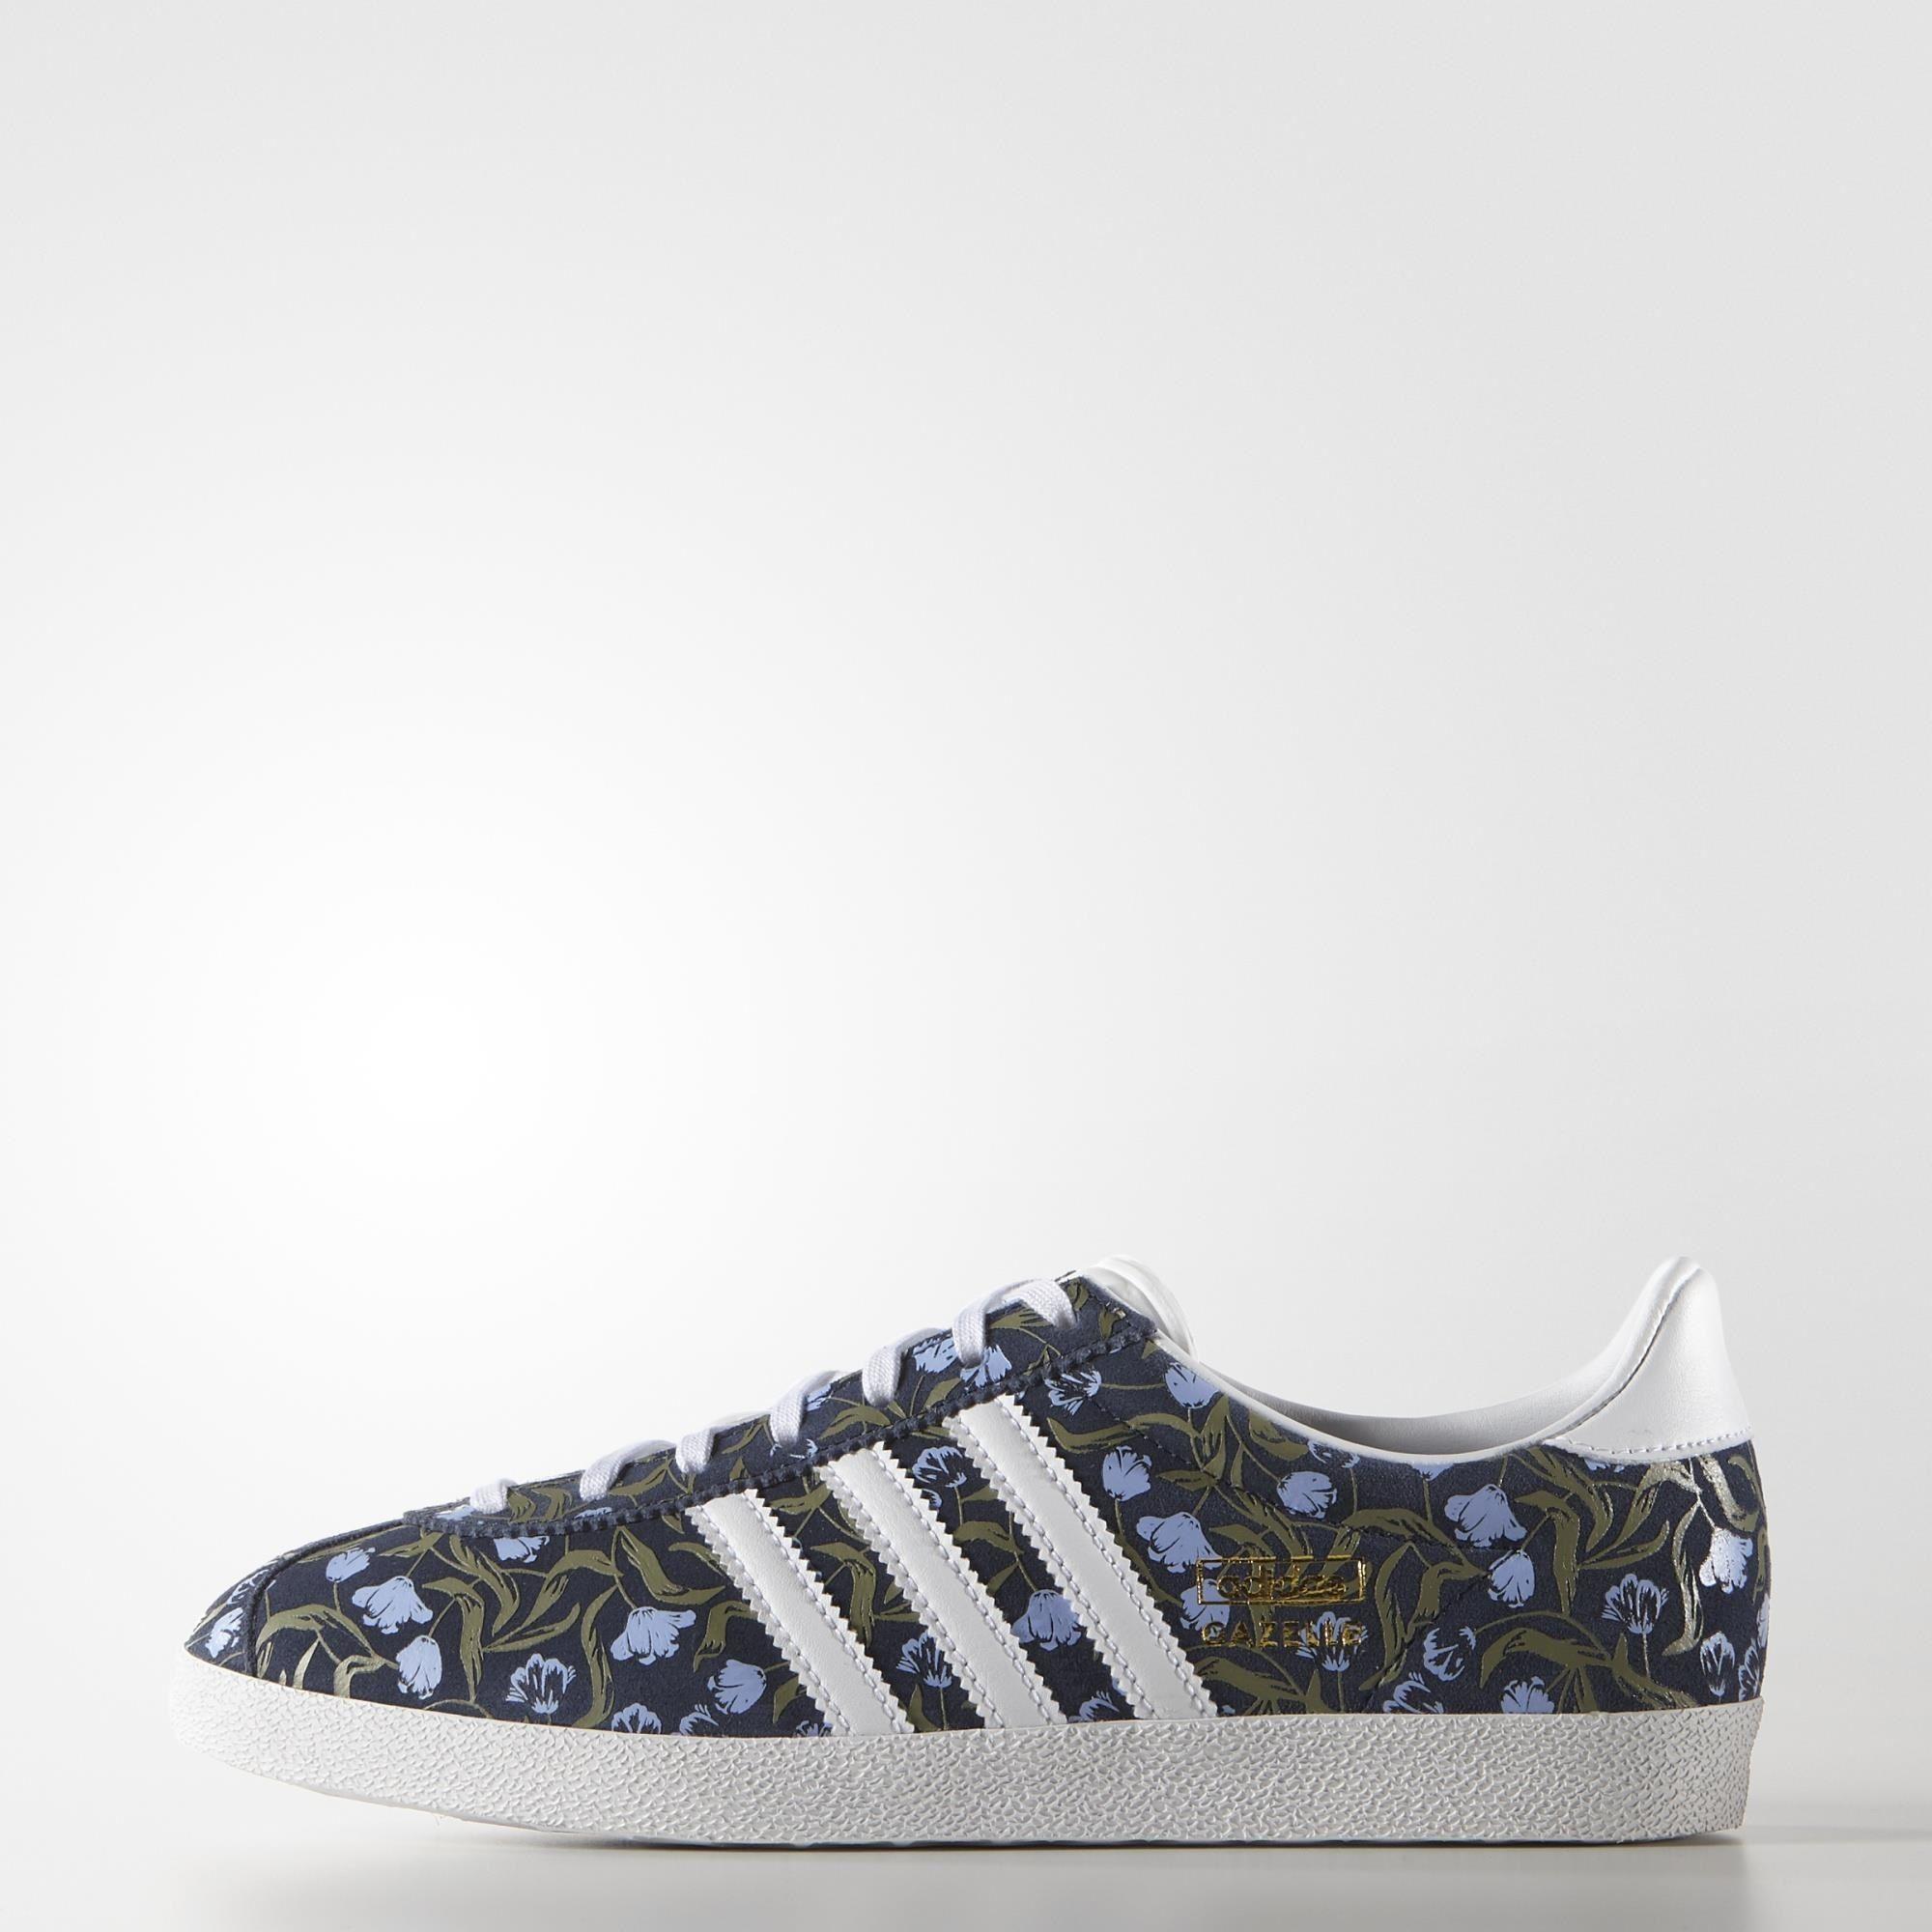 adidas gazzella og w blu adidas unito nuova attrezzatura pinterest